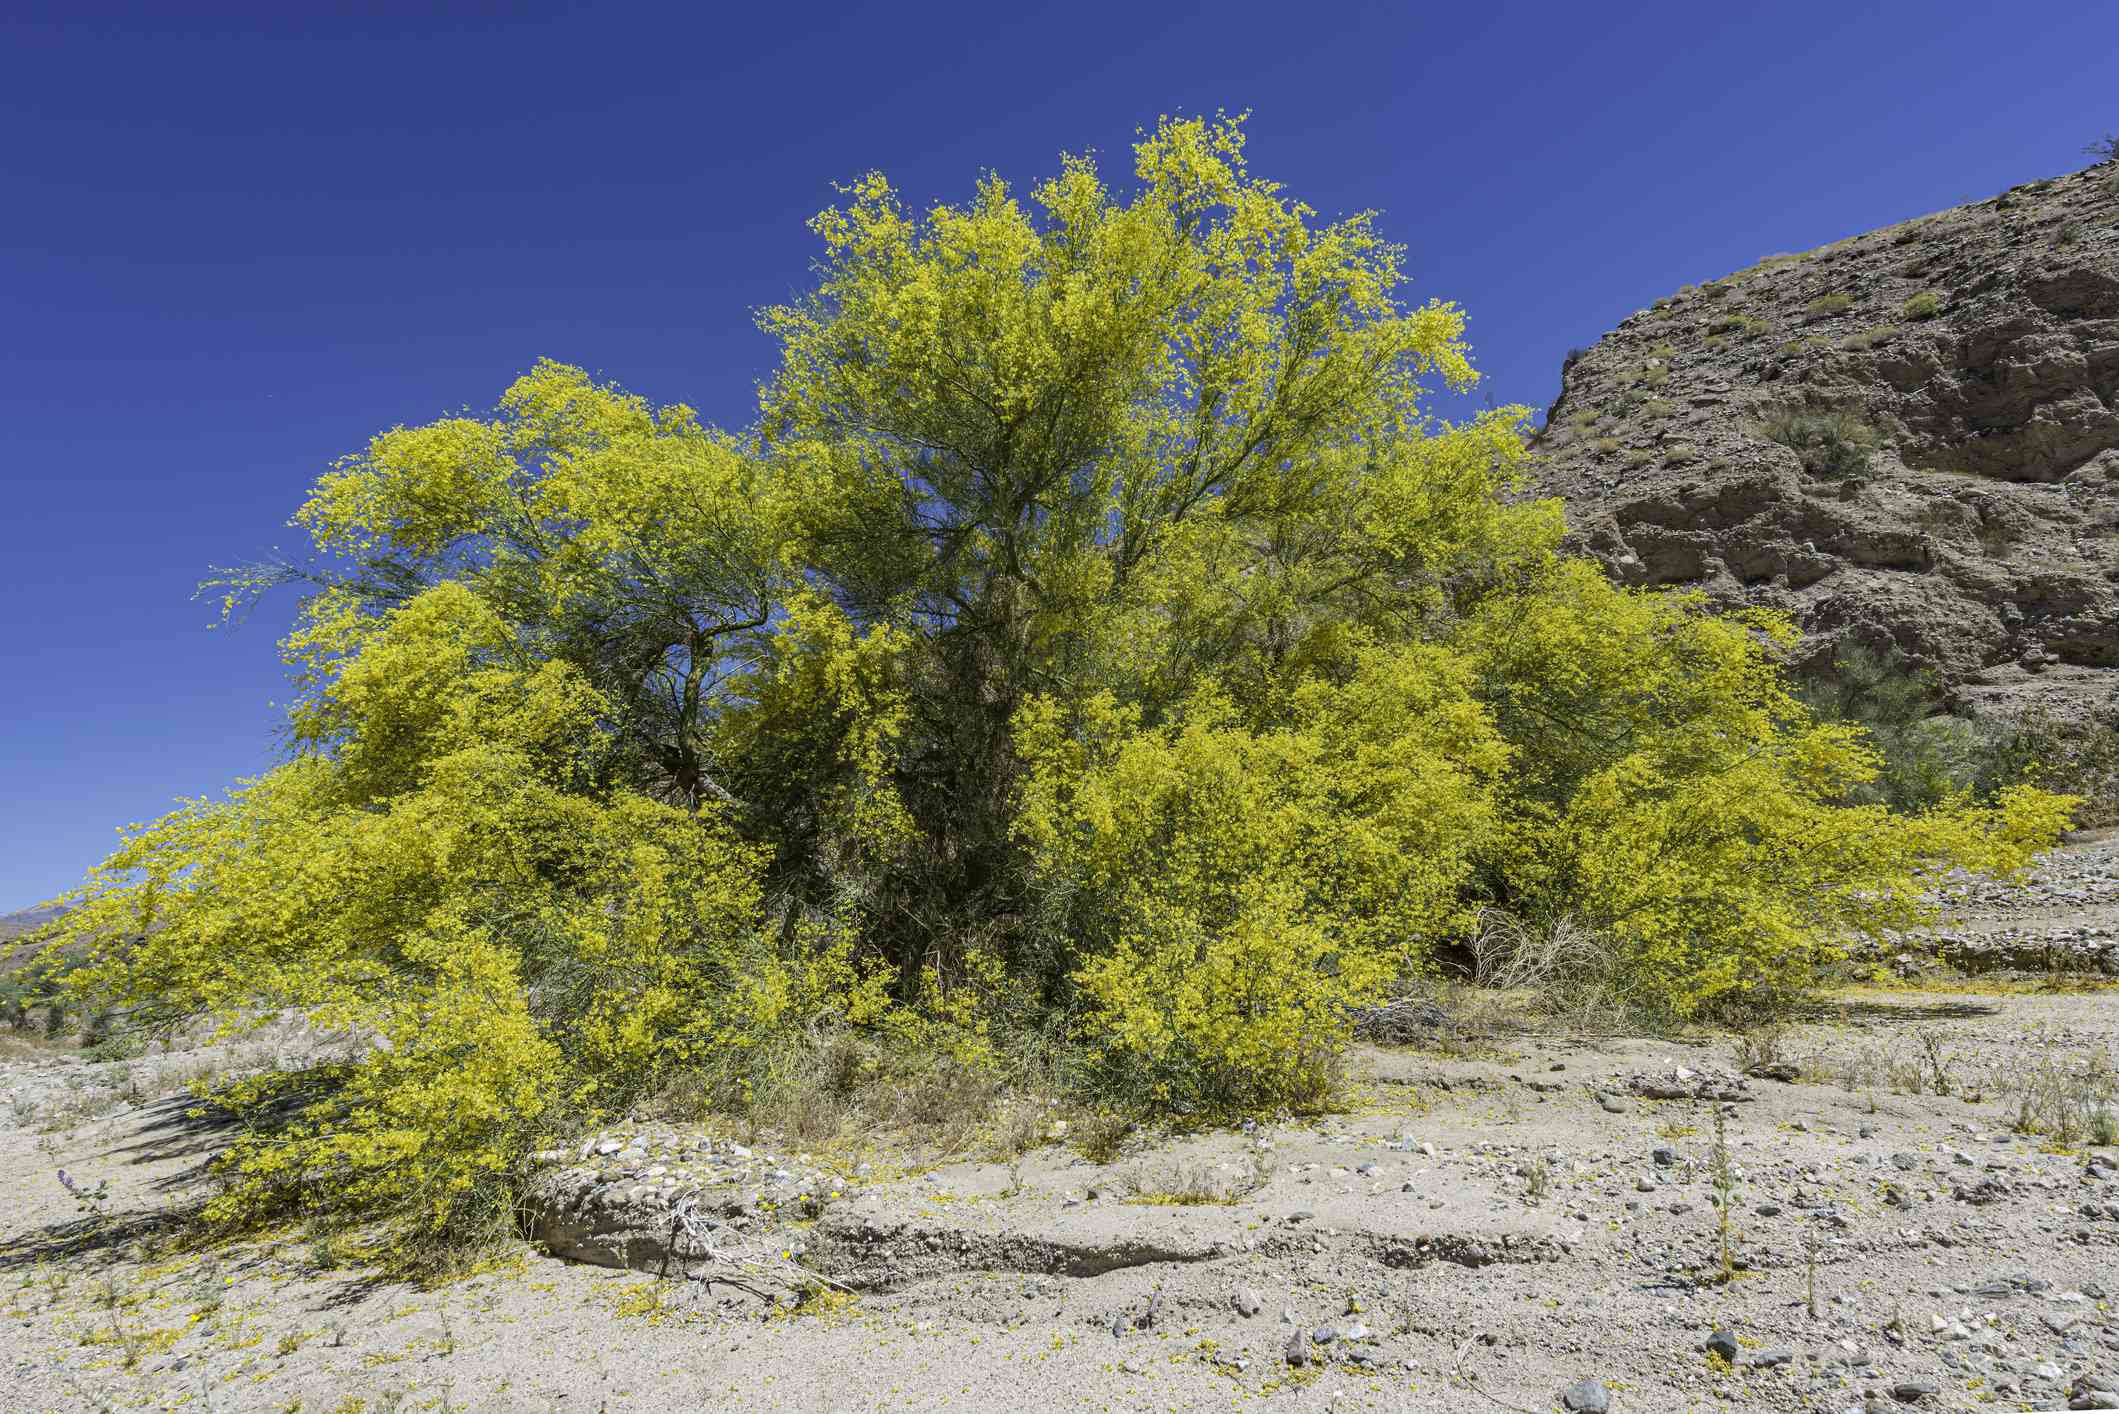 Blue palo verde (Parkinsonia florida) growing in a desert setting